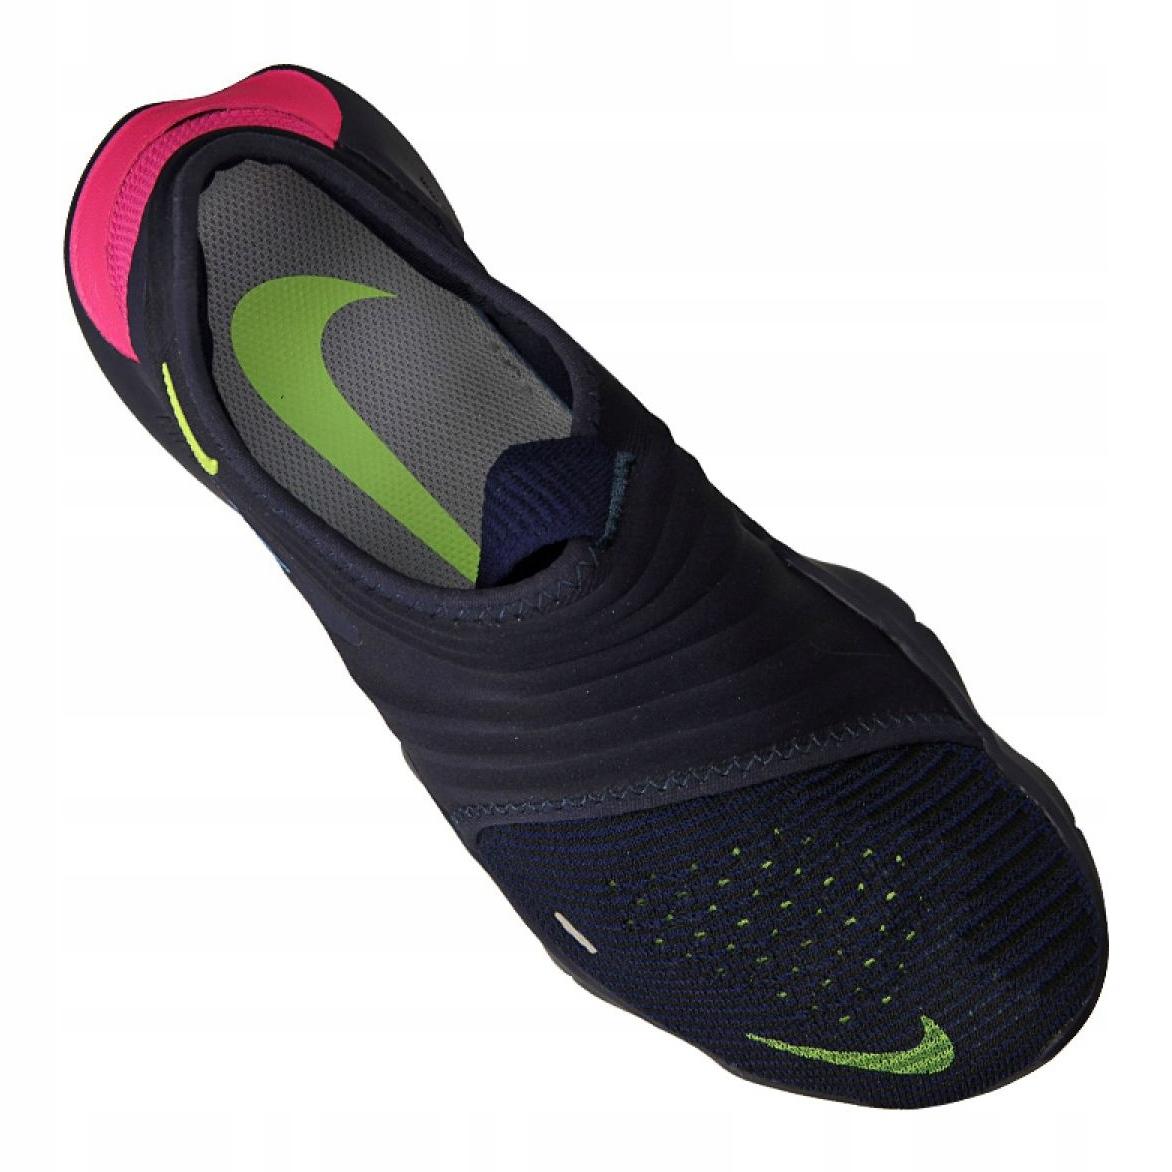 Marine Nike Free Rn Flyknit 3.0 M AQ5707 400 Schuhe